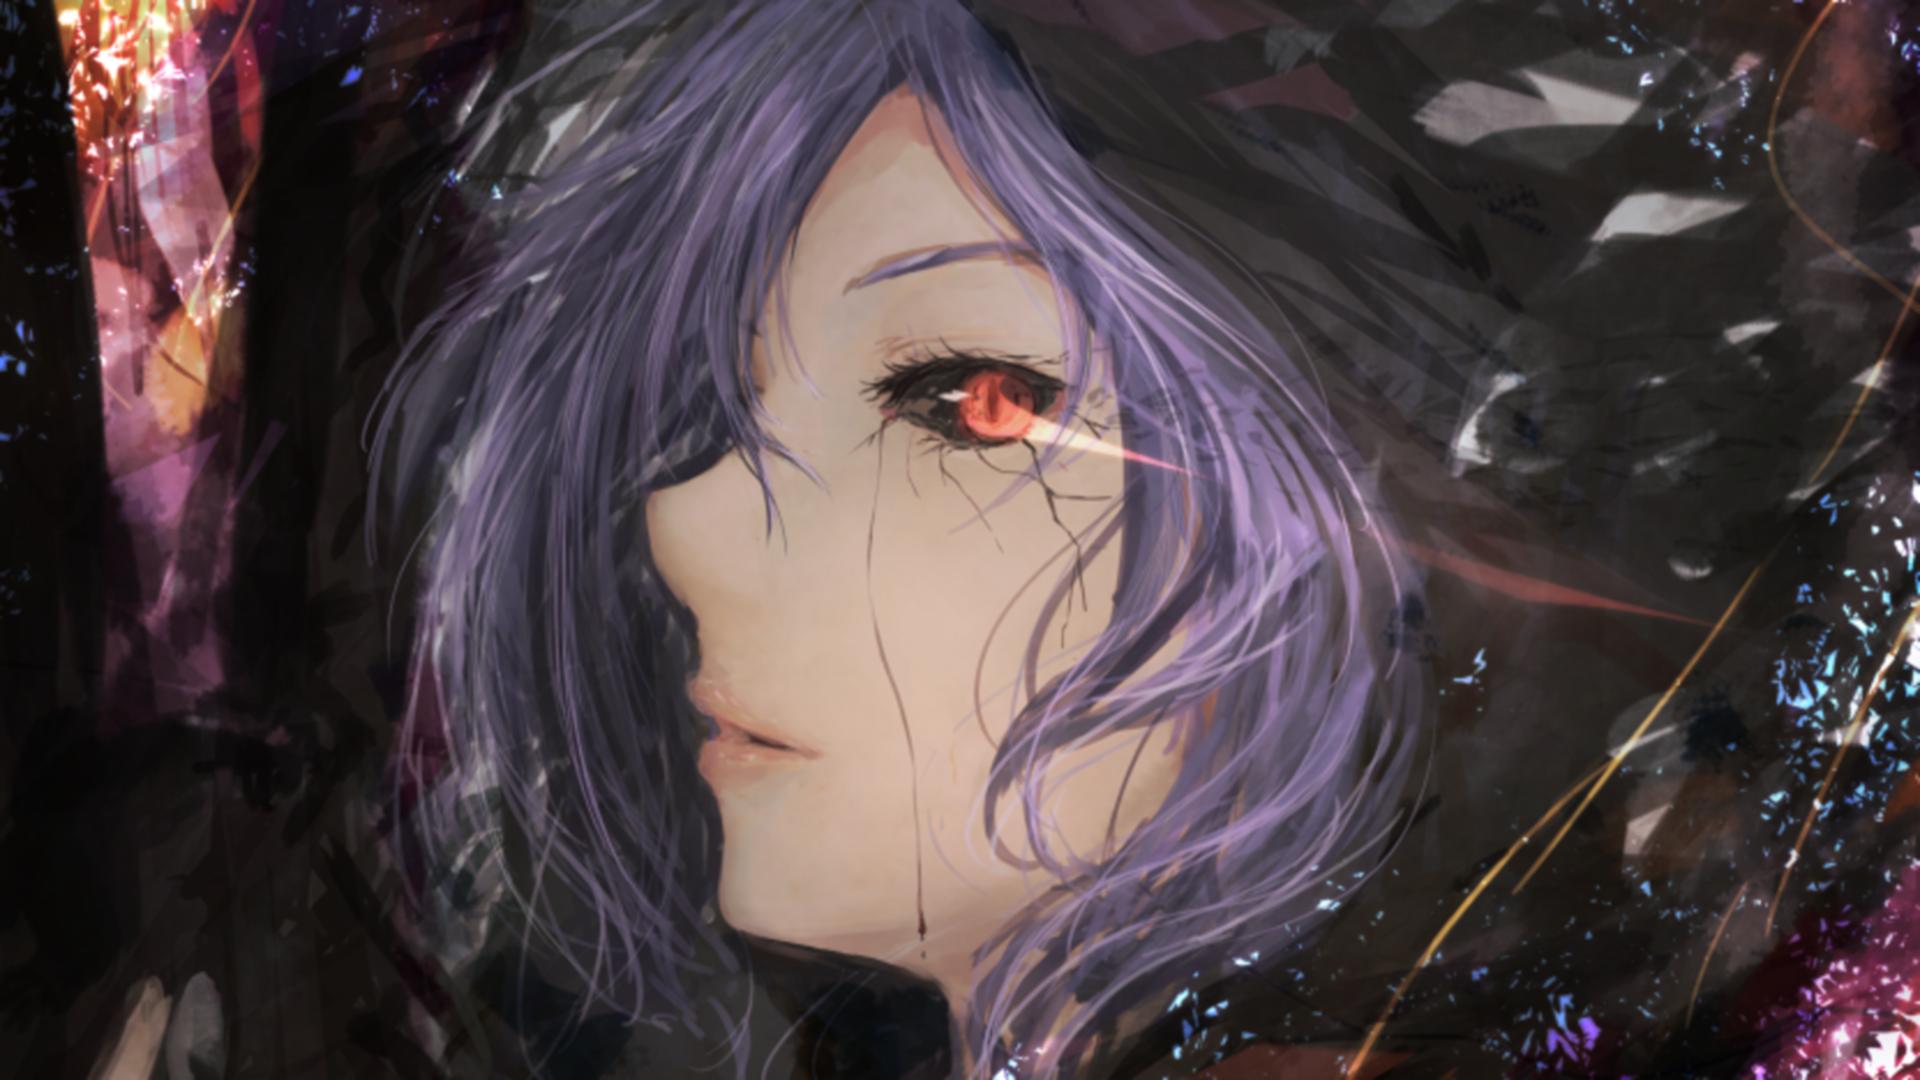 Wallpaper : fantasy art, anime girls, Tokyo Ghoul, Kirishima